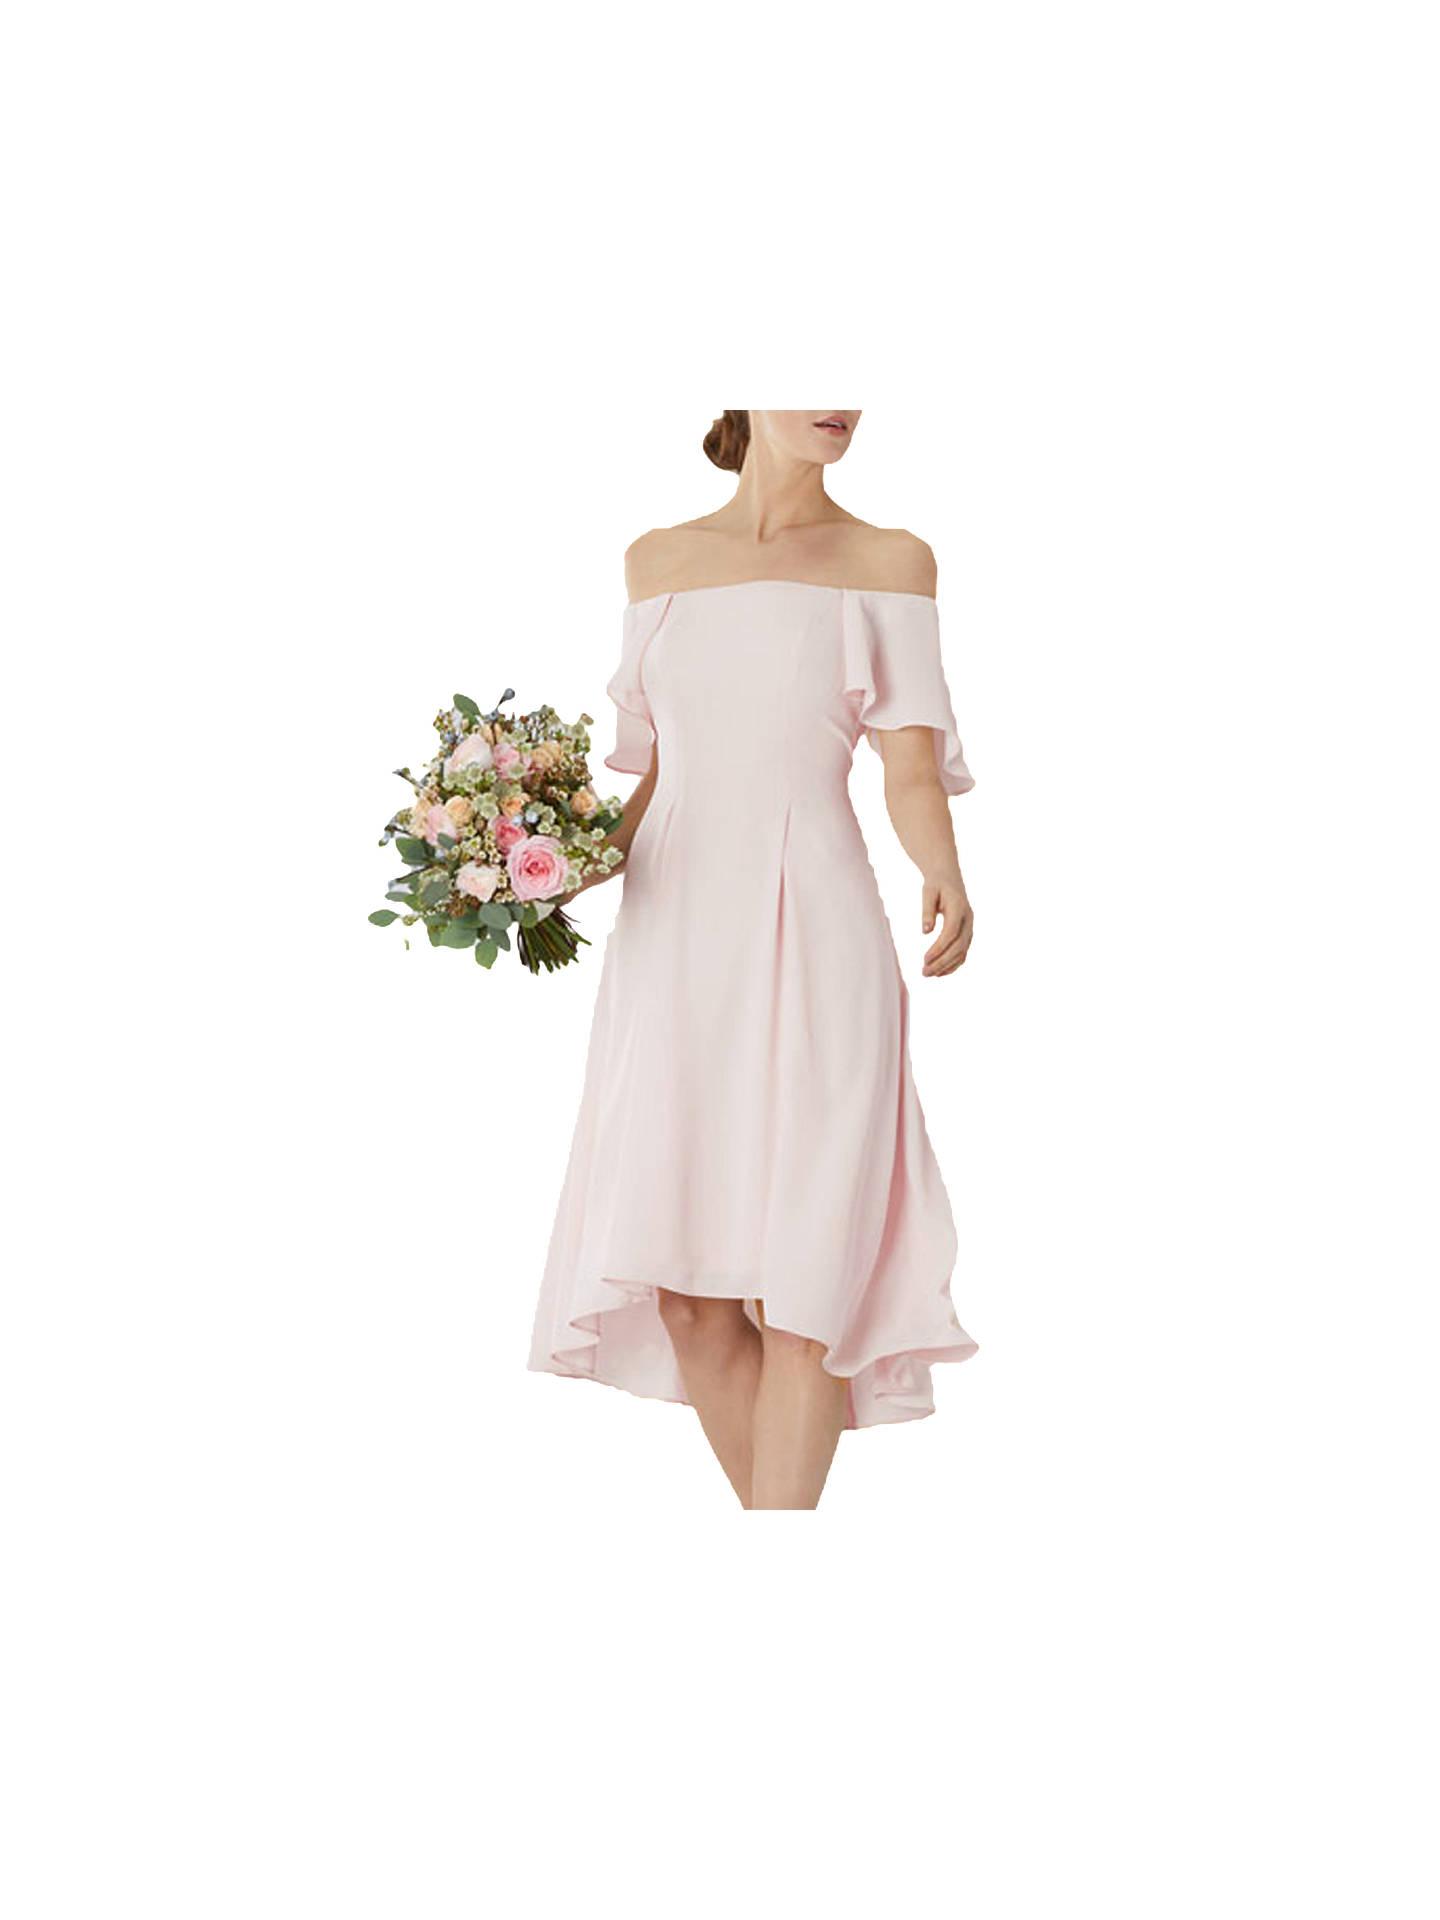 429dfa2f2e66 Buy Coast Betty Midi Dress, Blush, 6 Online at johnlewis.com ...